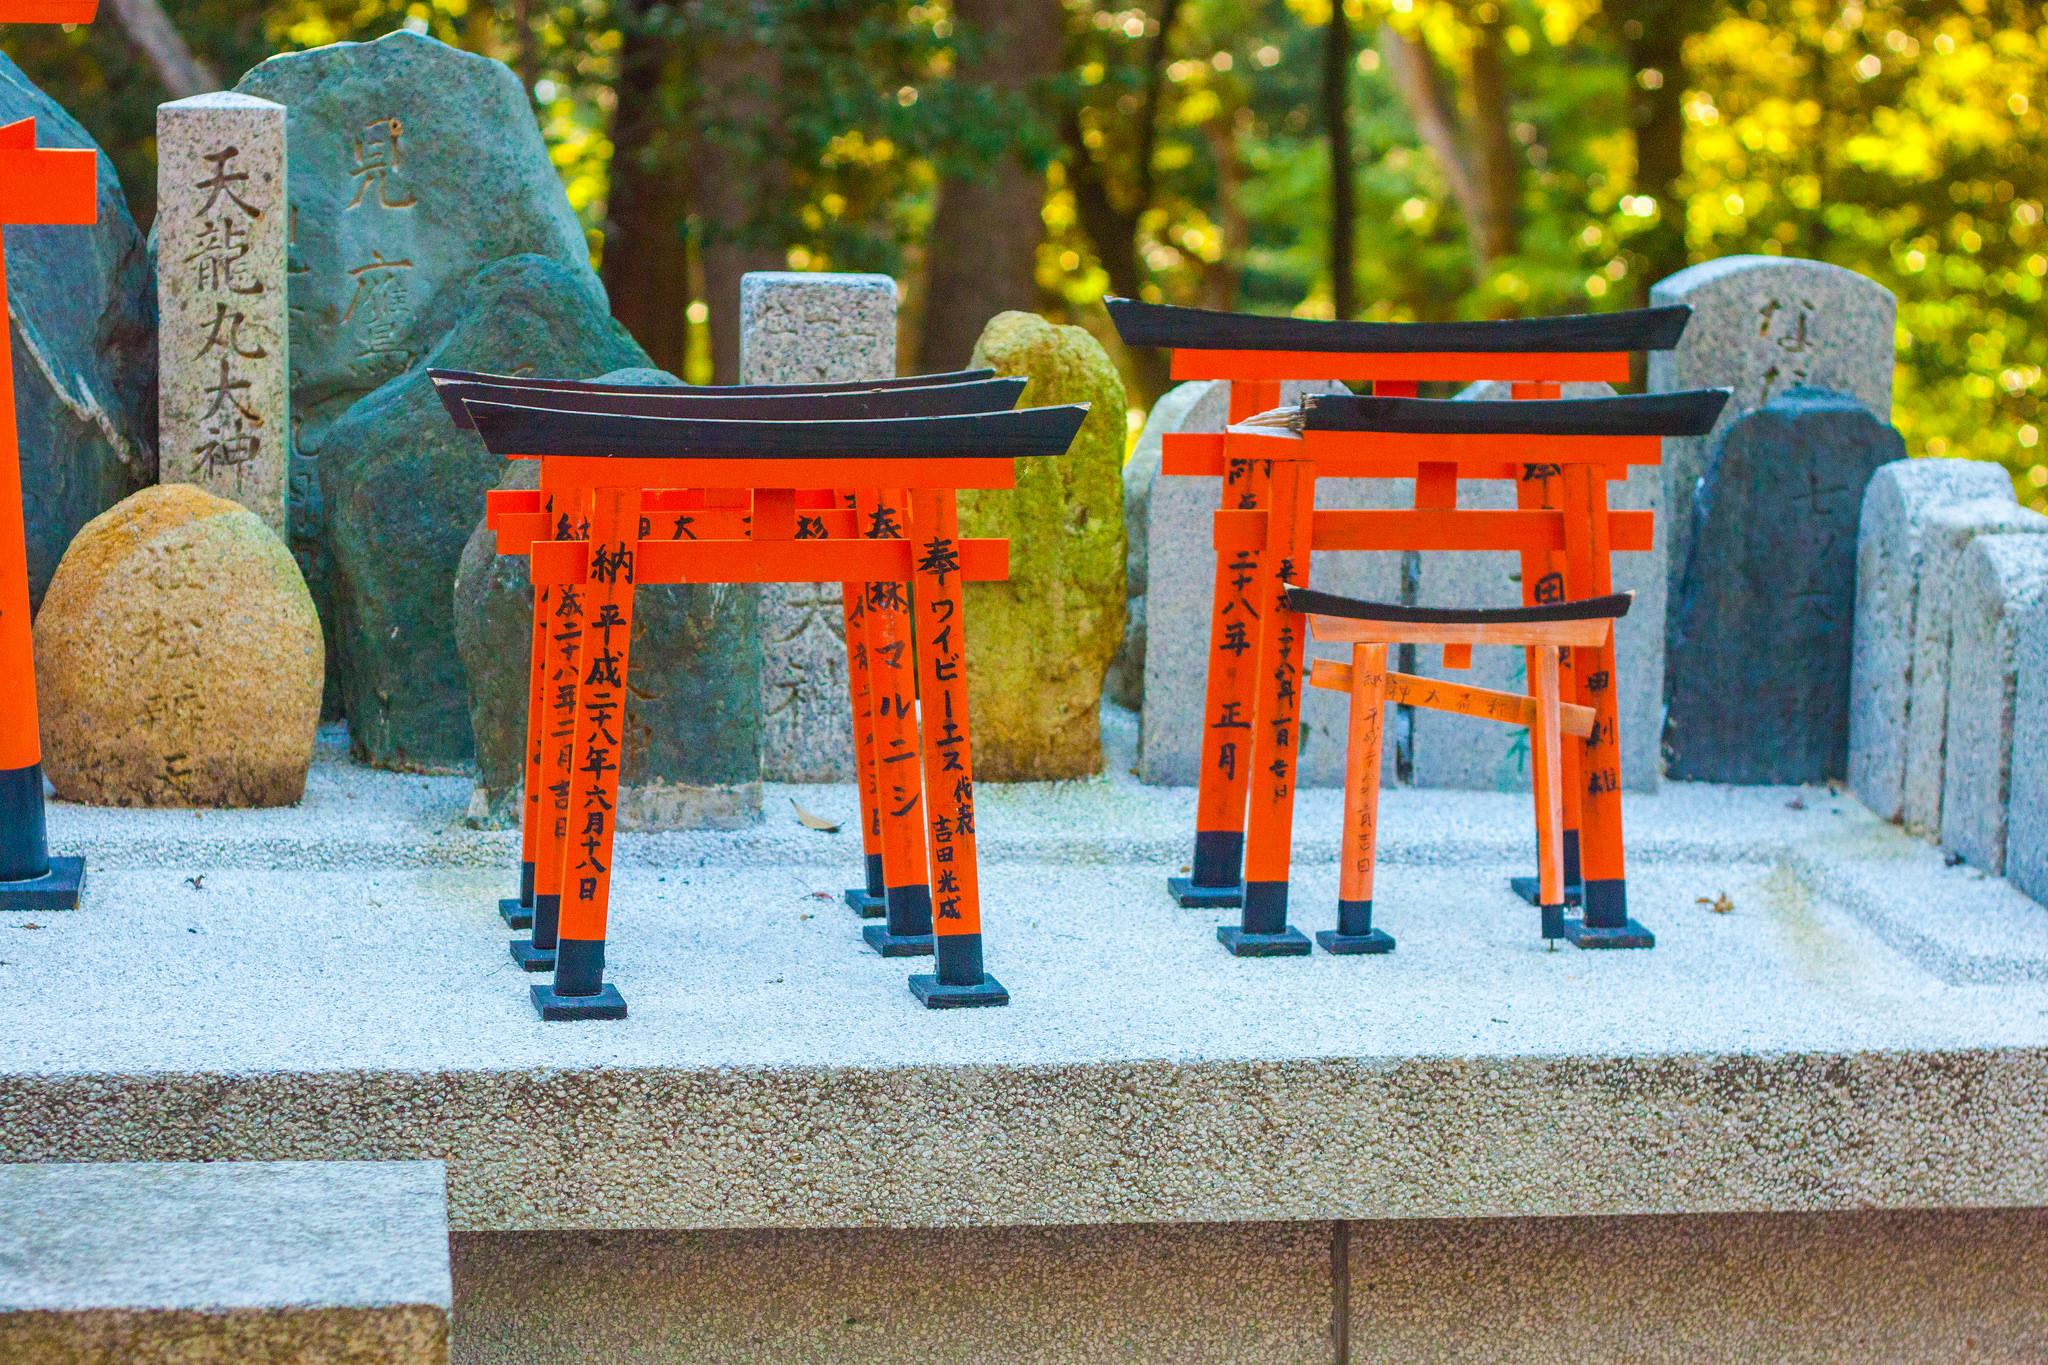 The Ultimate Walking Tour of Kyoto's Incredible Fushimi Inari Shrine's 10,000 torii gates